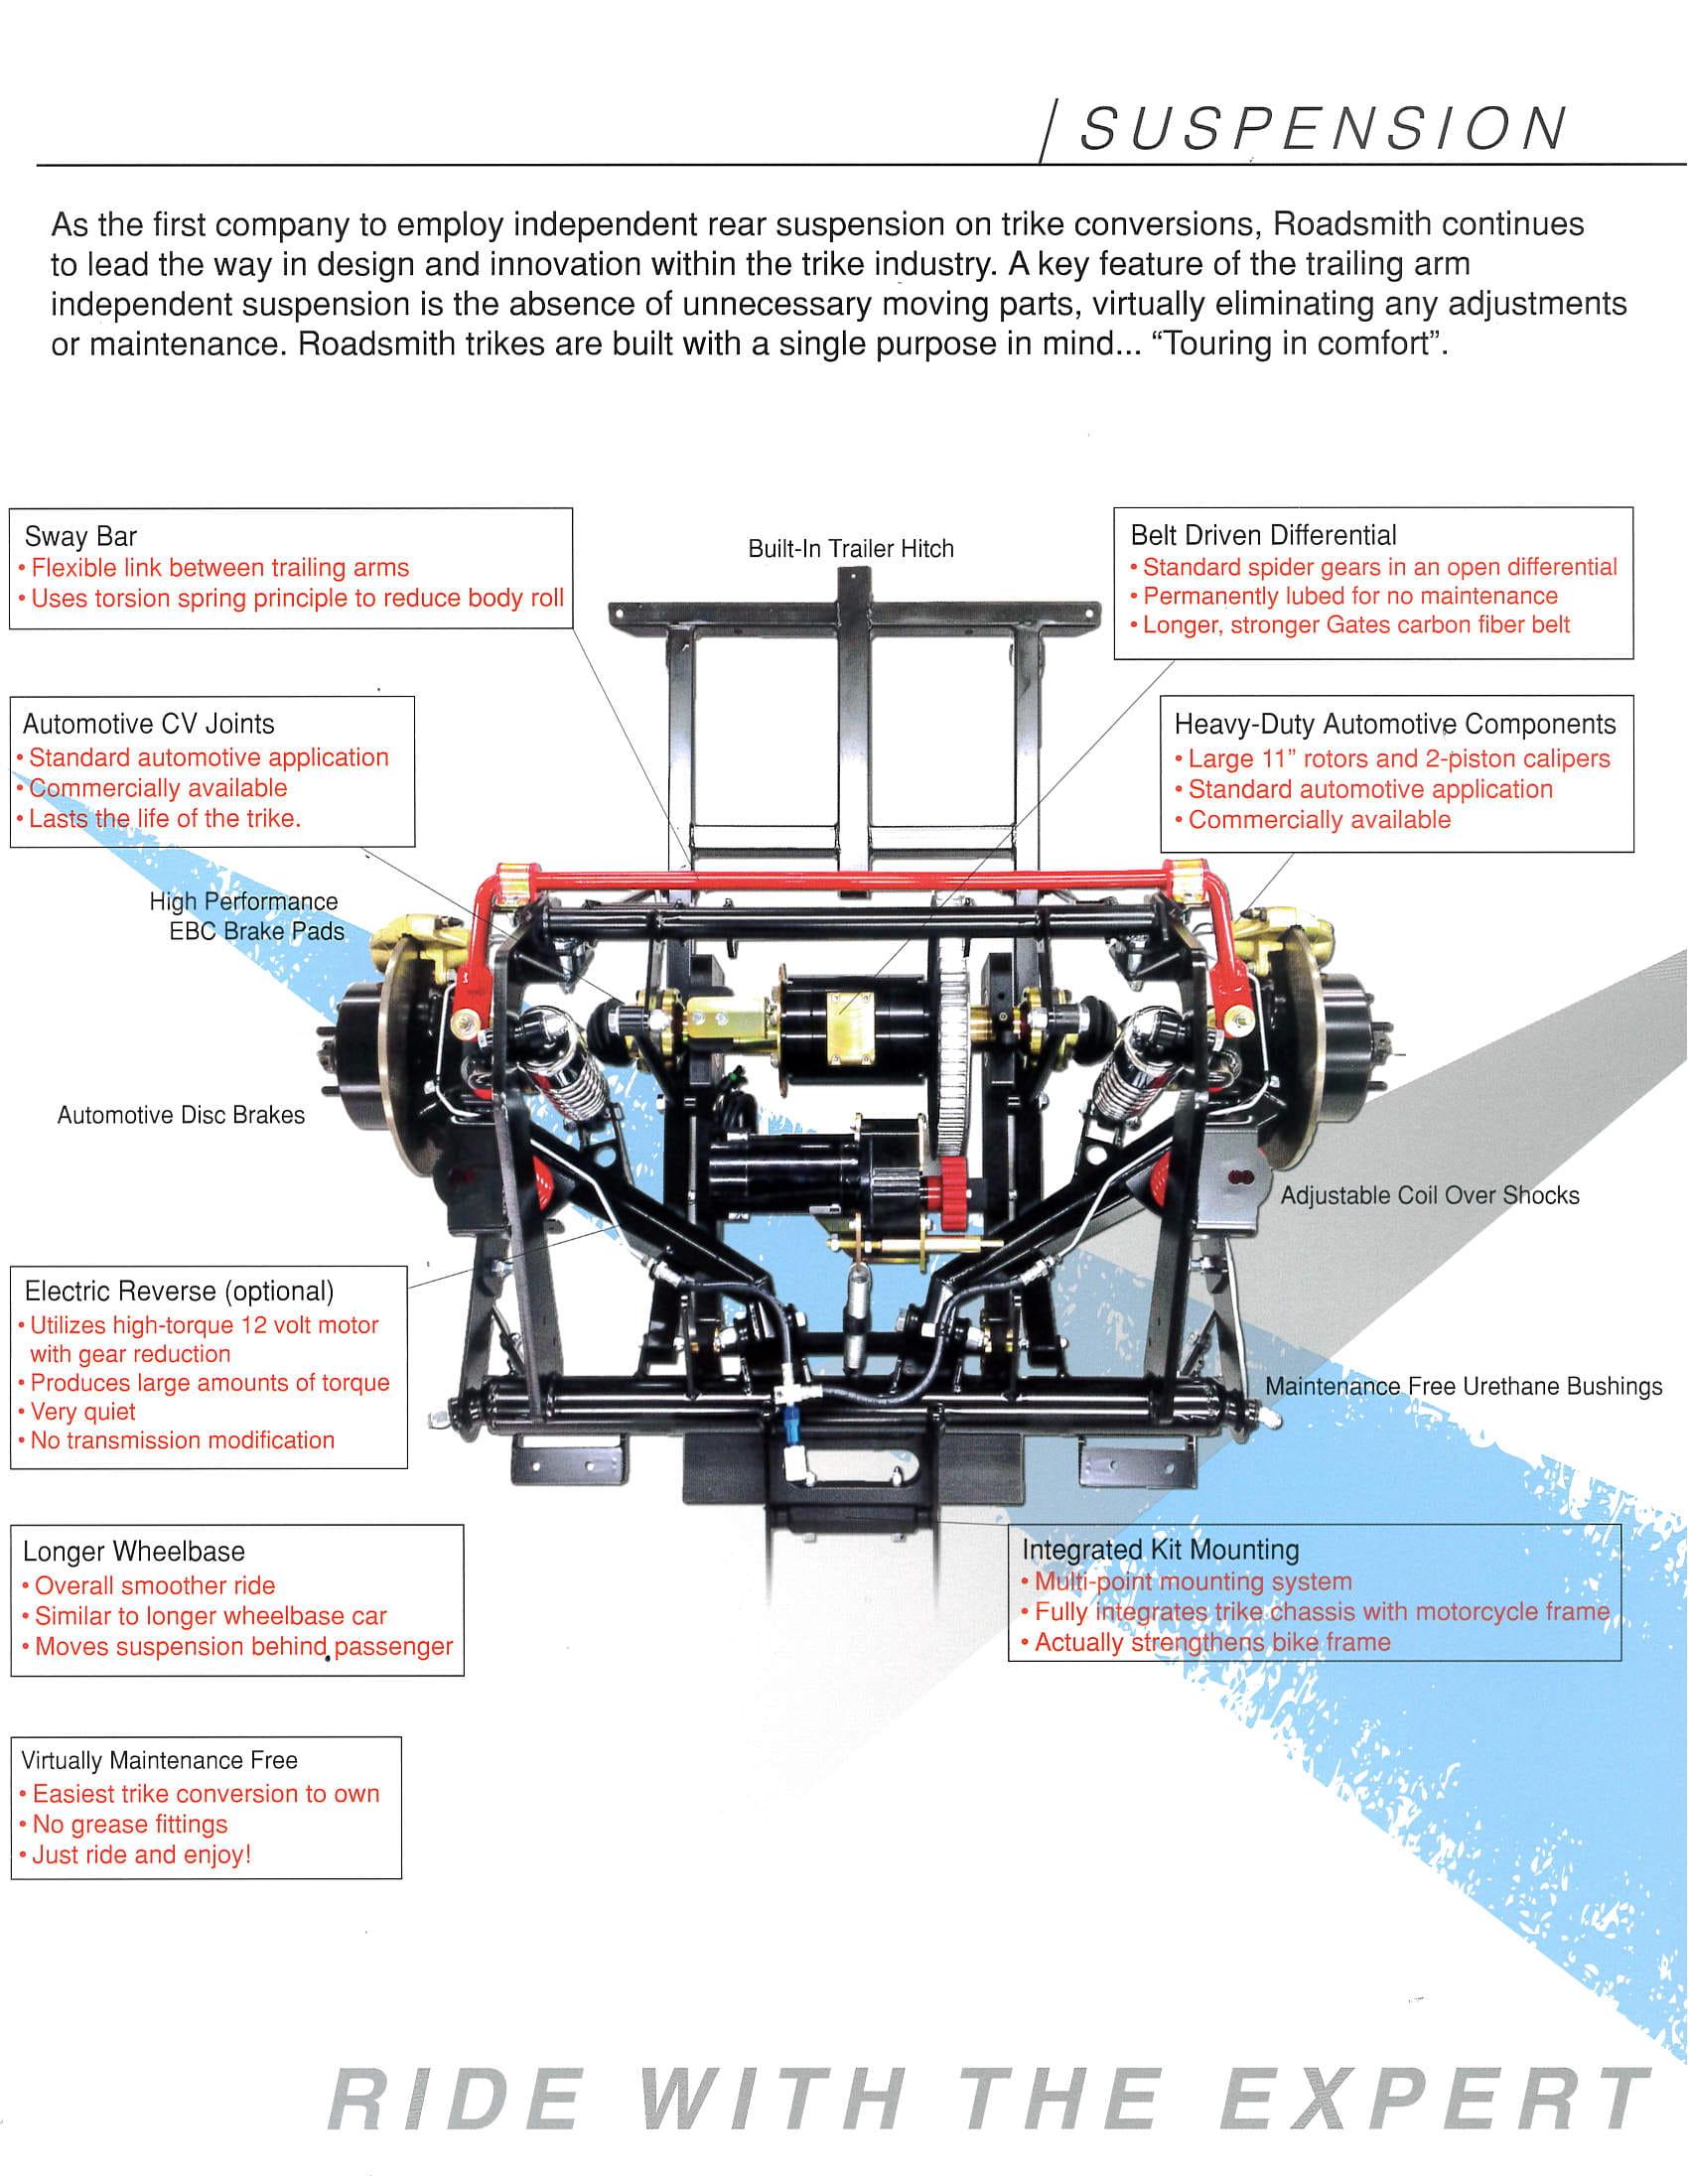 Softail independent suspension trike kit info.jpg